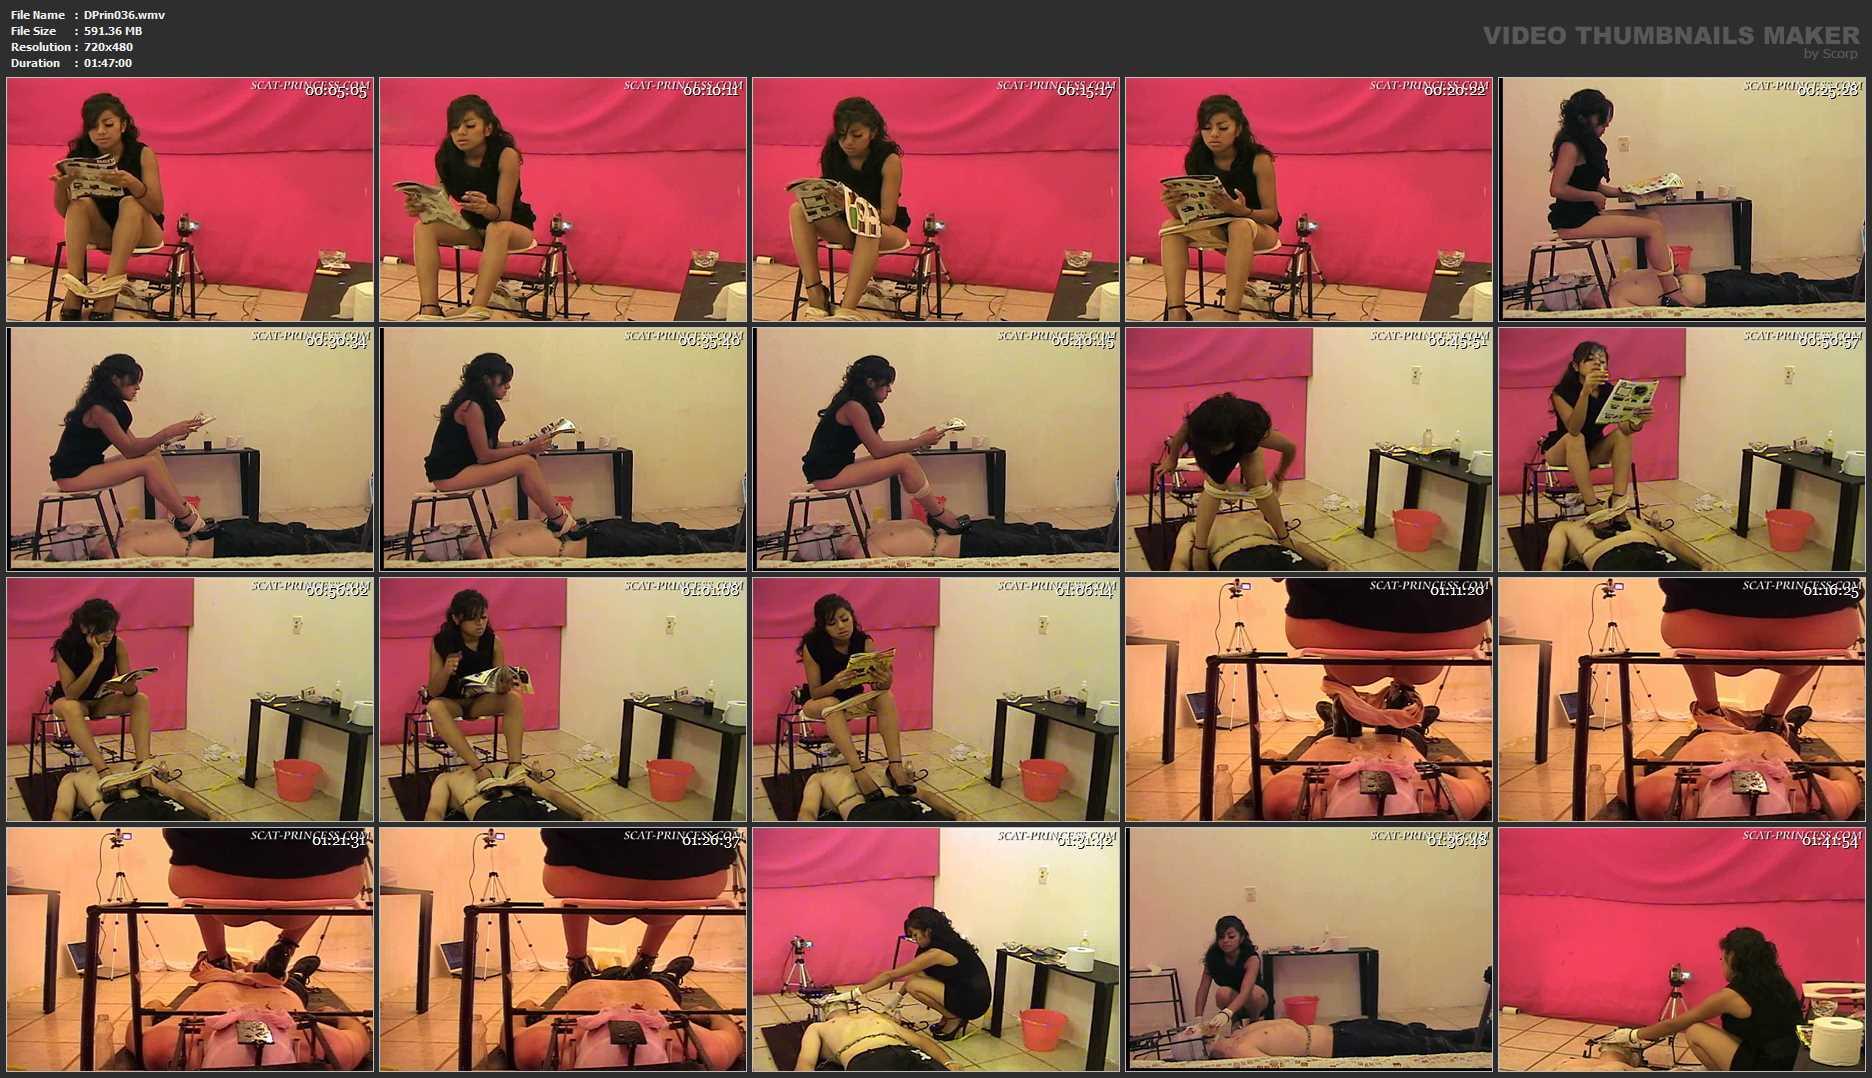 [DOM-PRINCESS] Tania Chair [SD][480p][WMV]